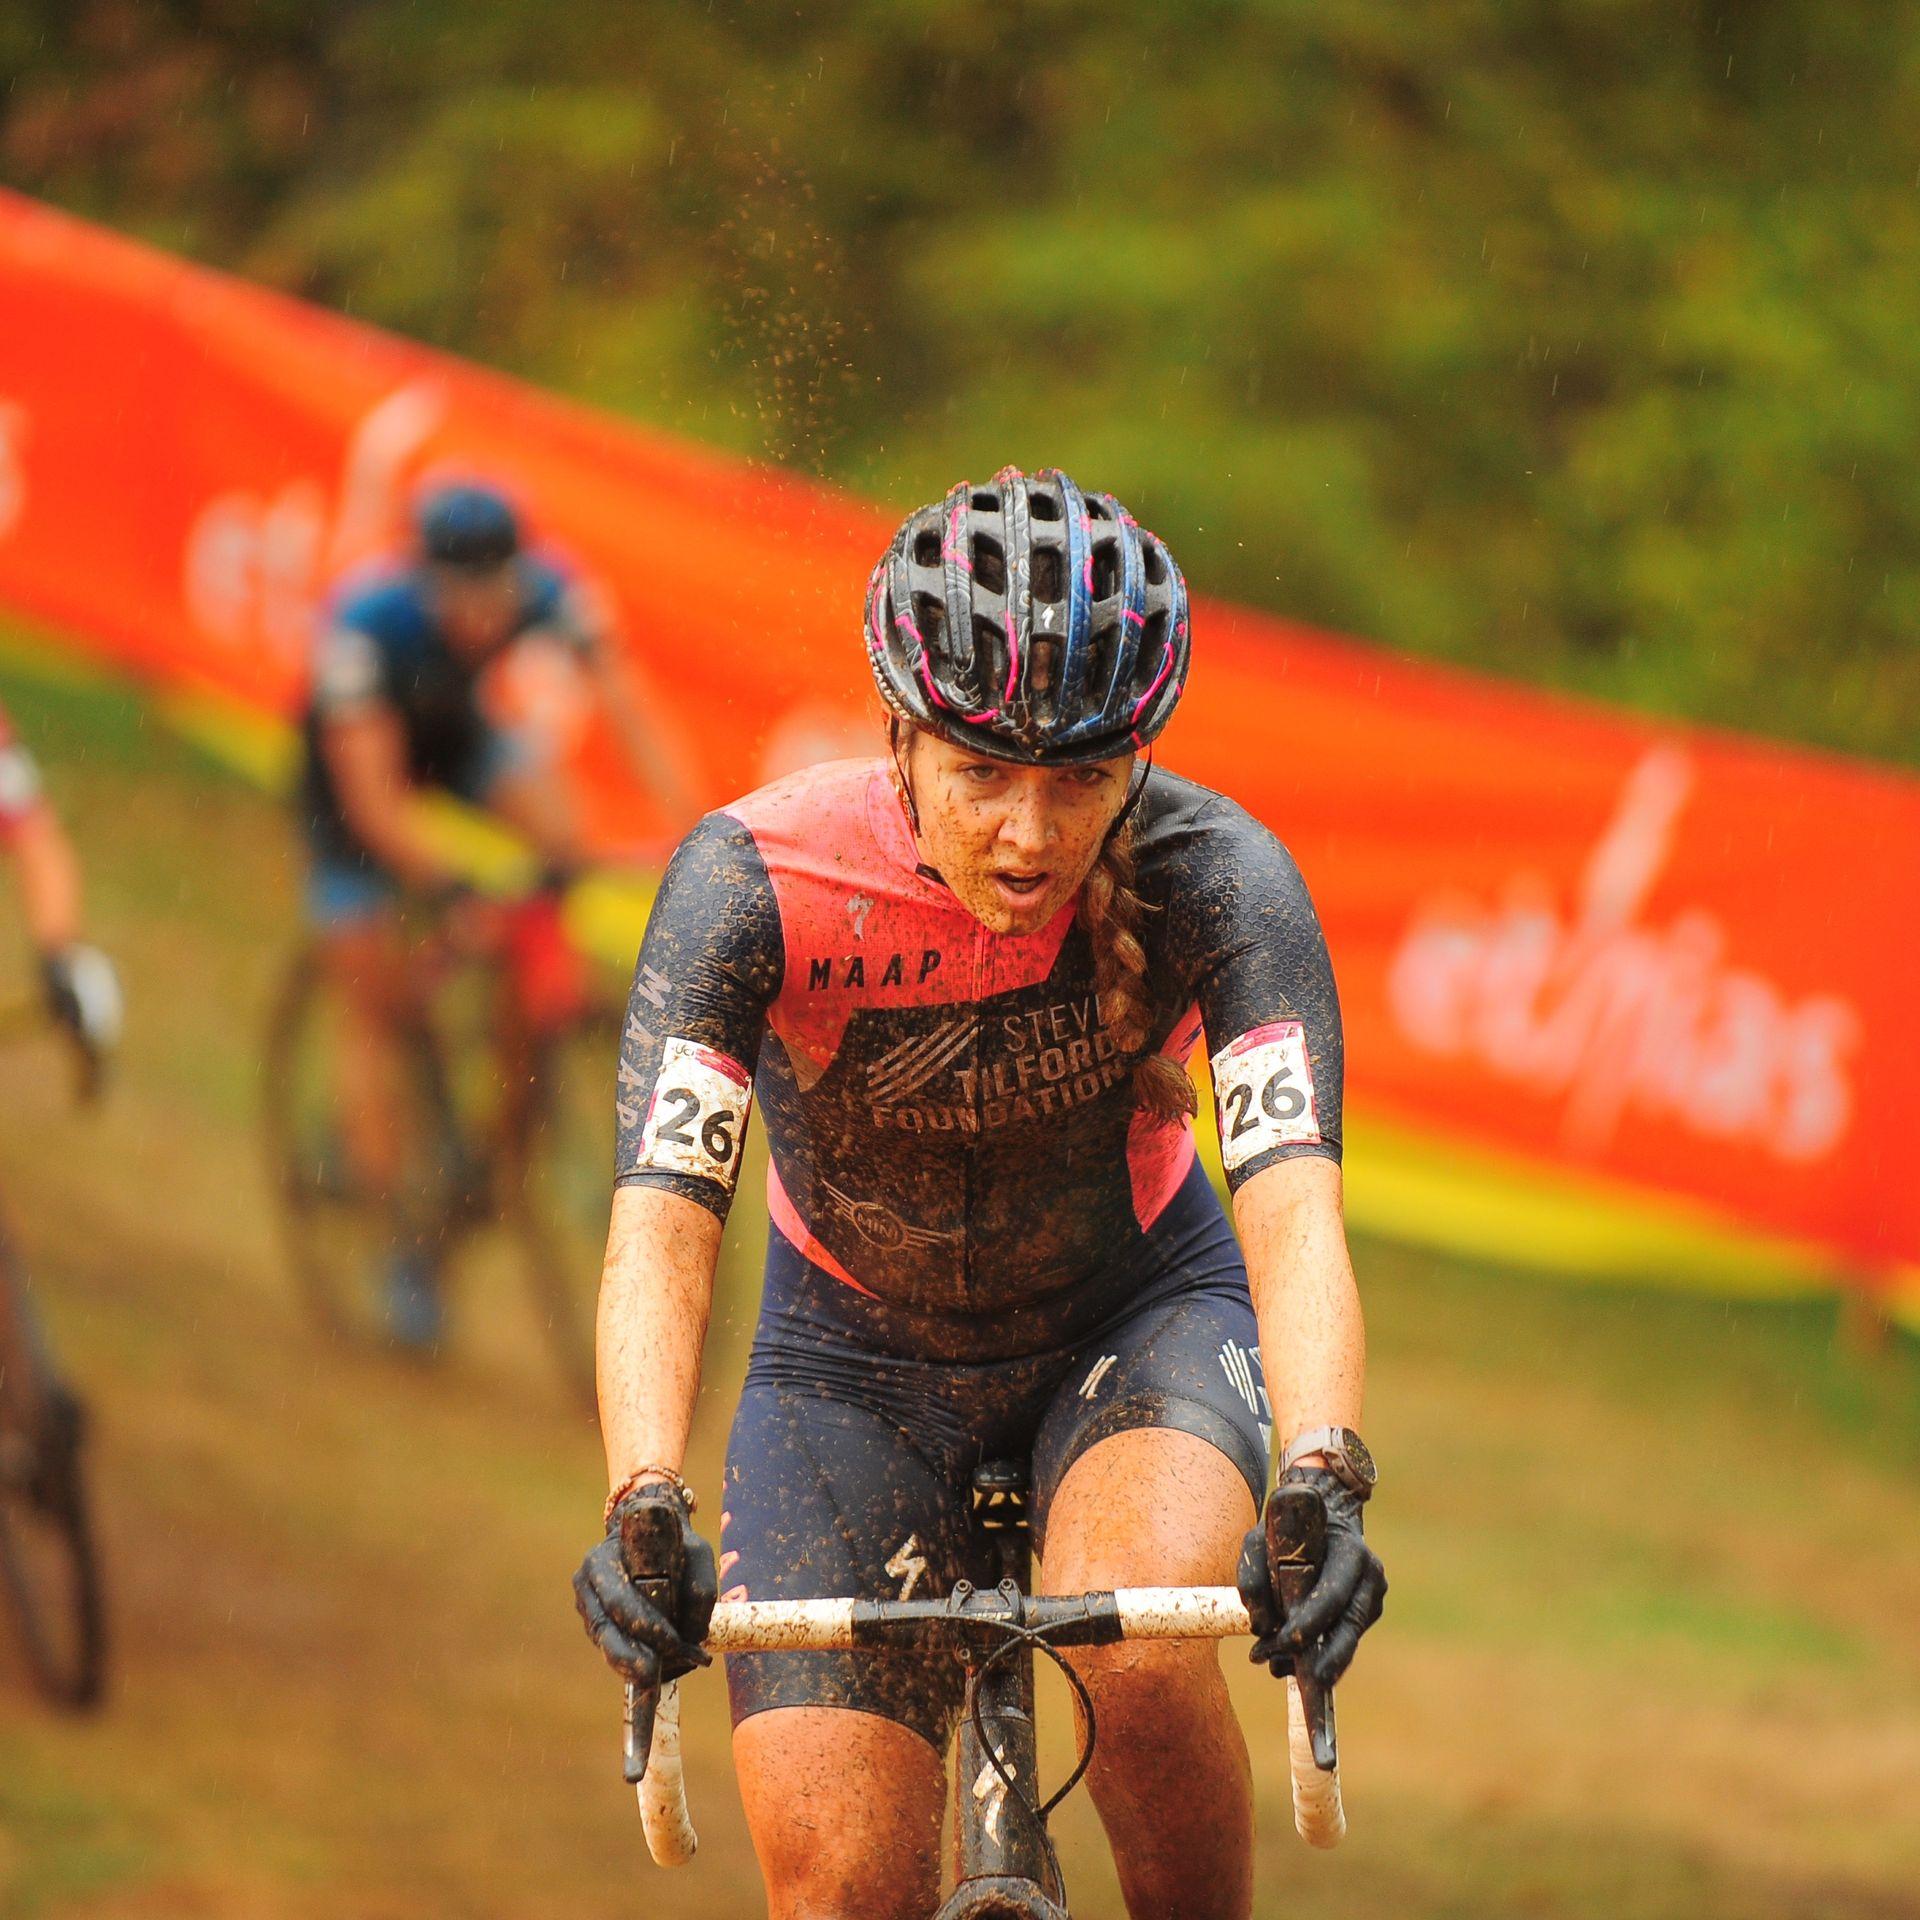 Determined woman racing a bike in the rain.